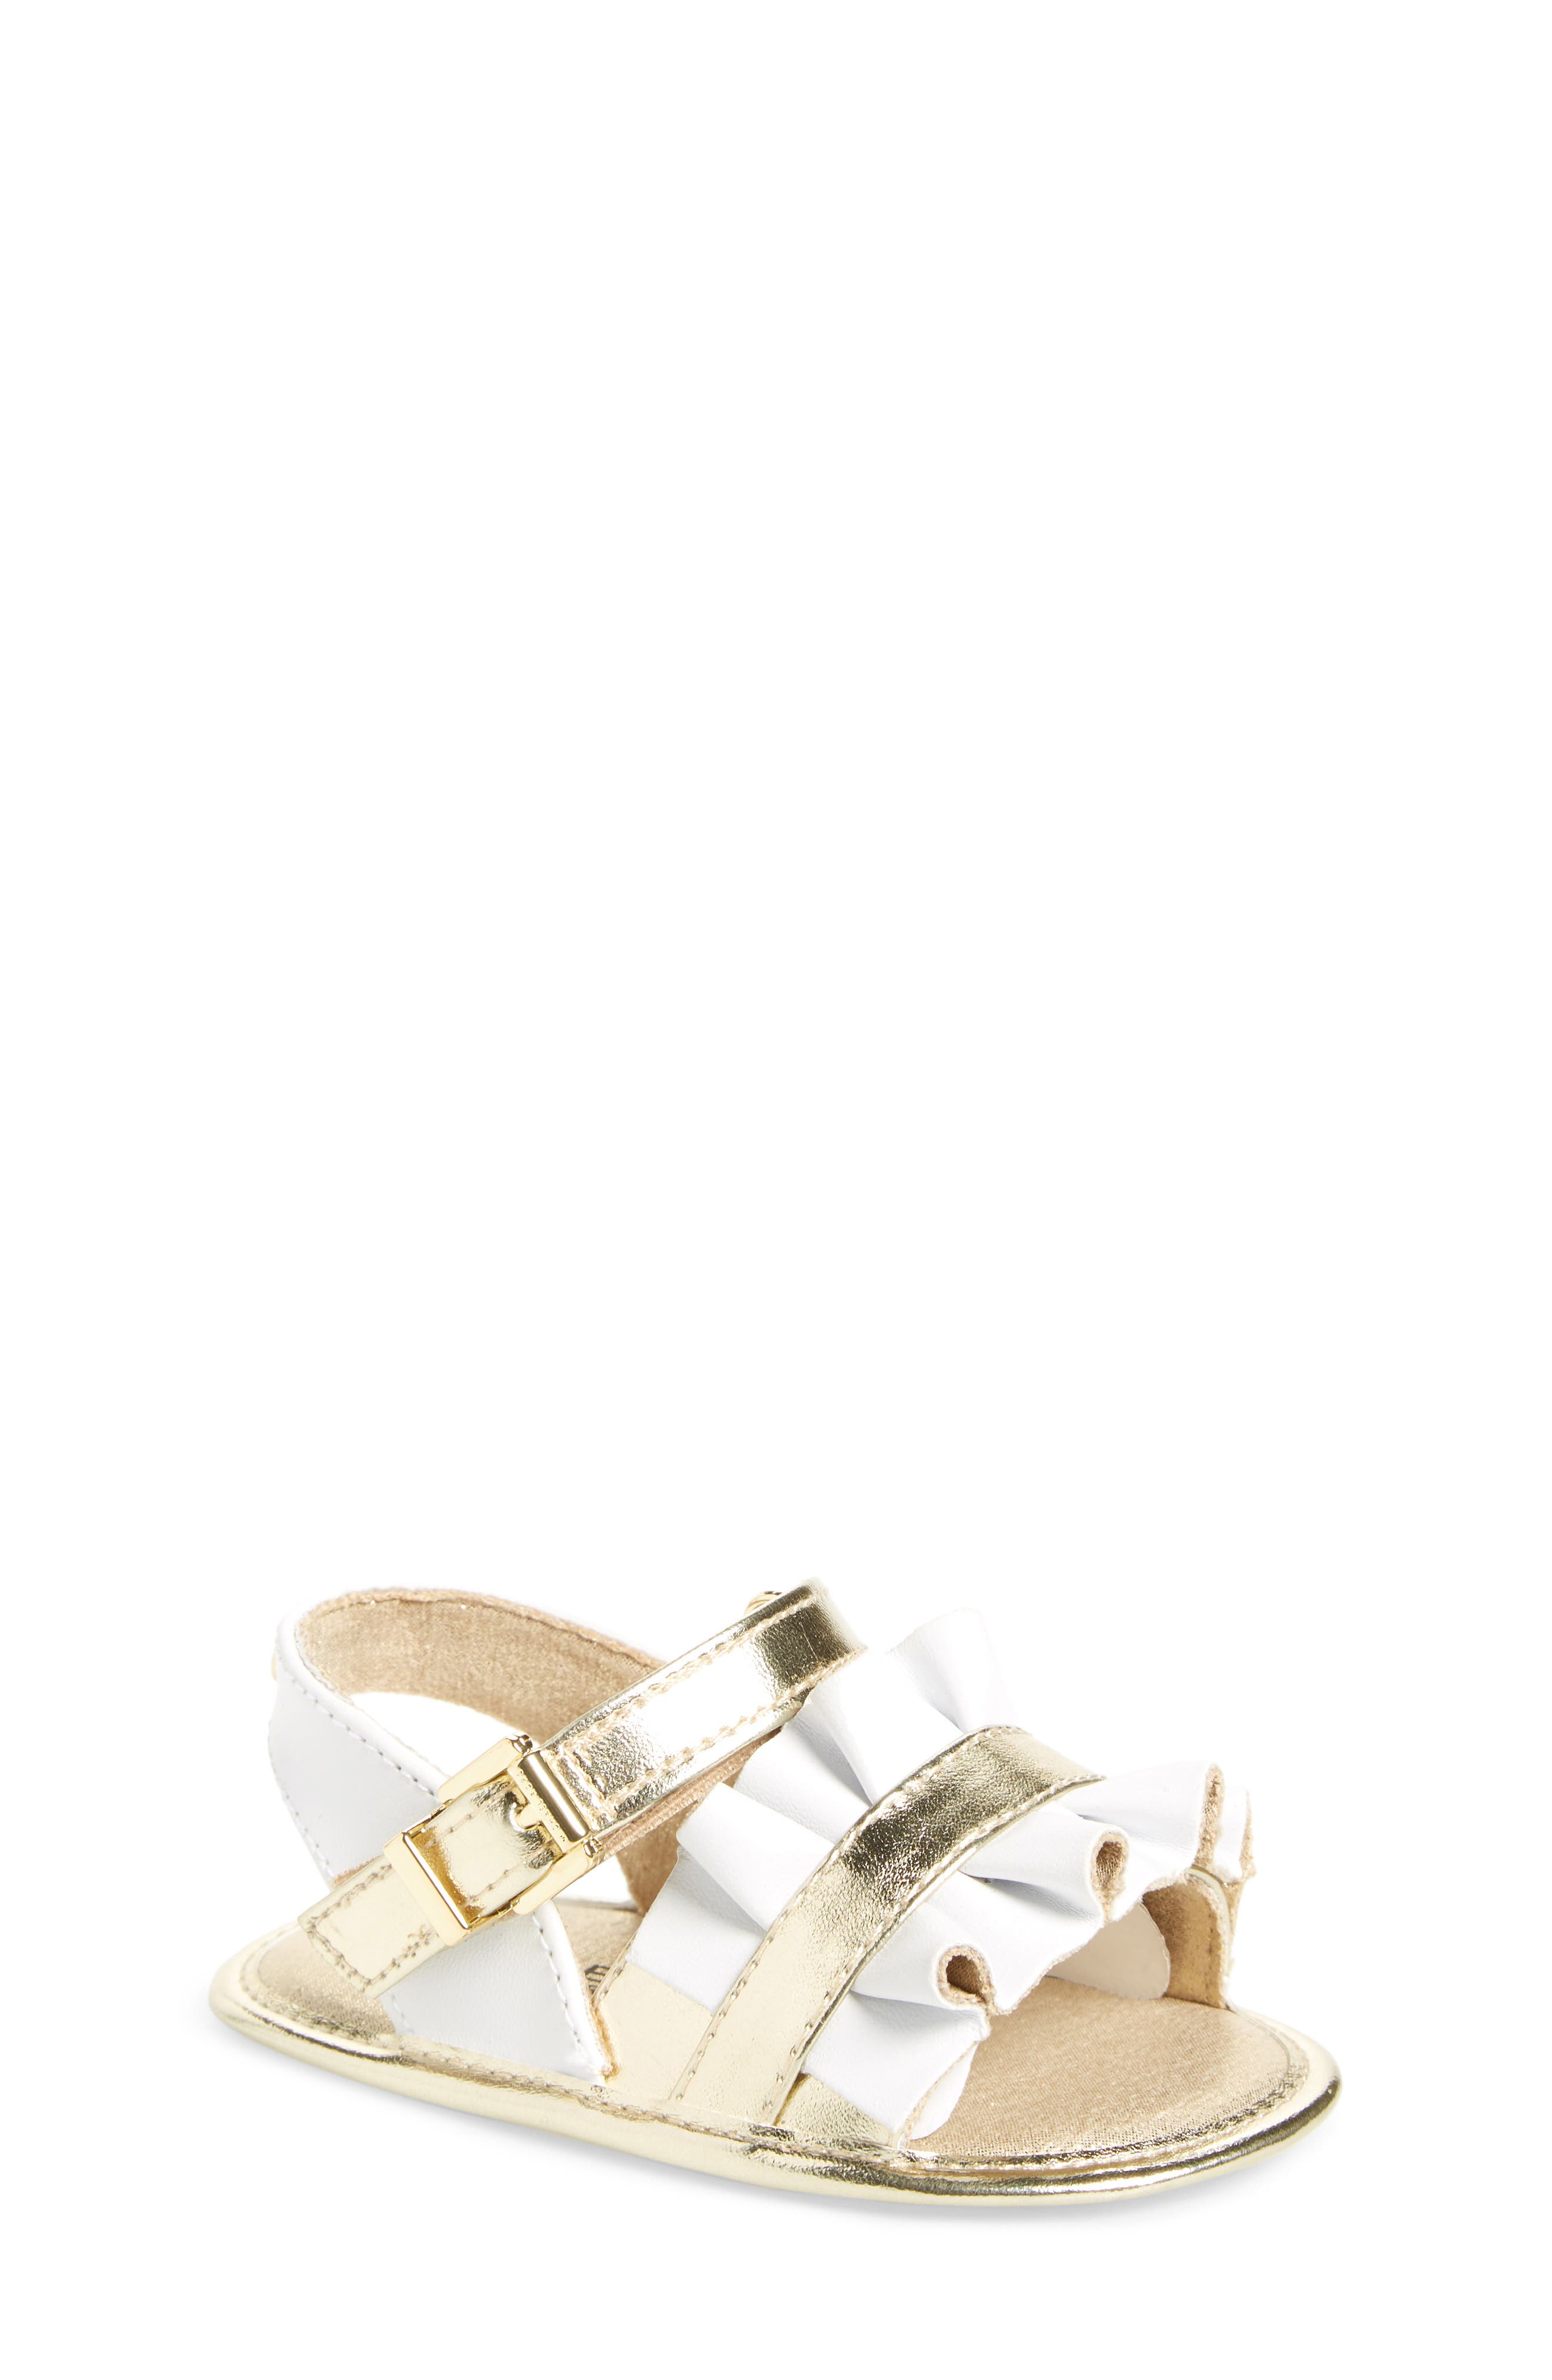 Baby Free Metallic Ruffled Sandal,                         Main,                         color, White Gold